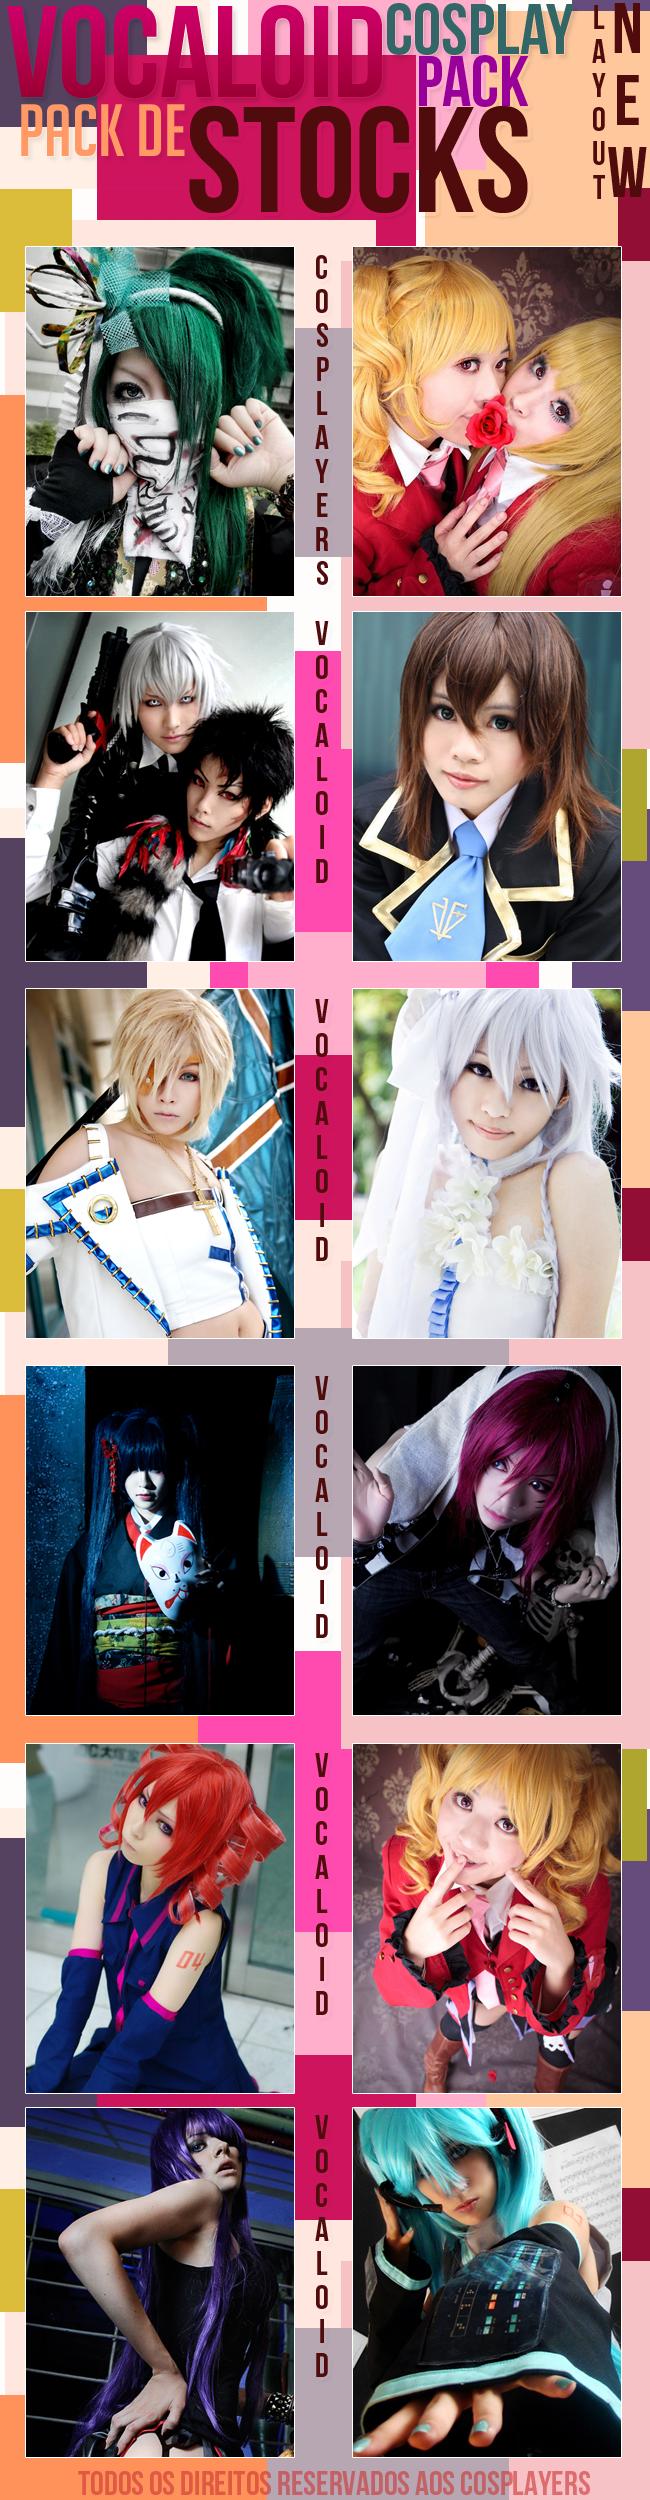 Vocaloid Pack de Stock 4.0 Vocaloid_pack_de_stocks_4_0_cosplayers_by_hootd-d4gkgvi